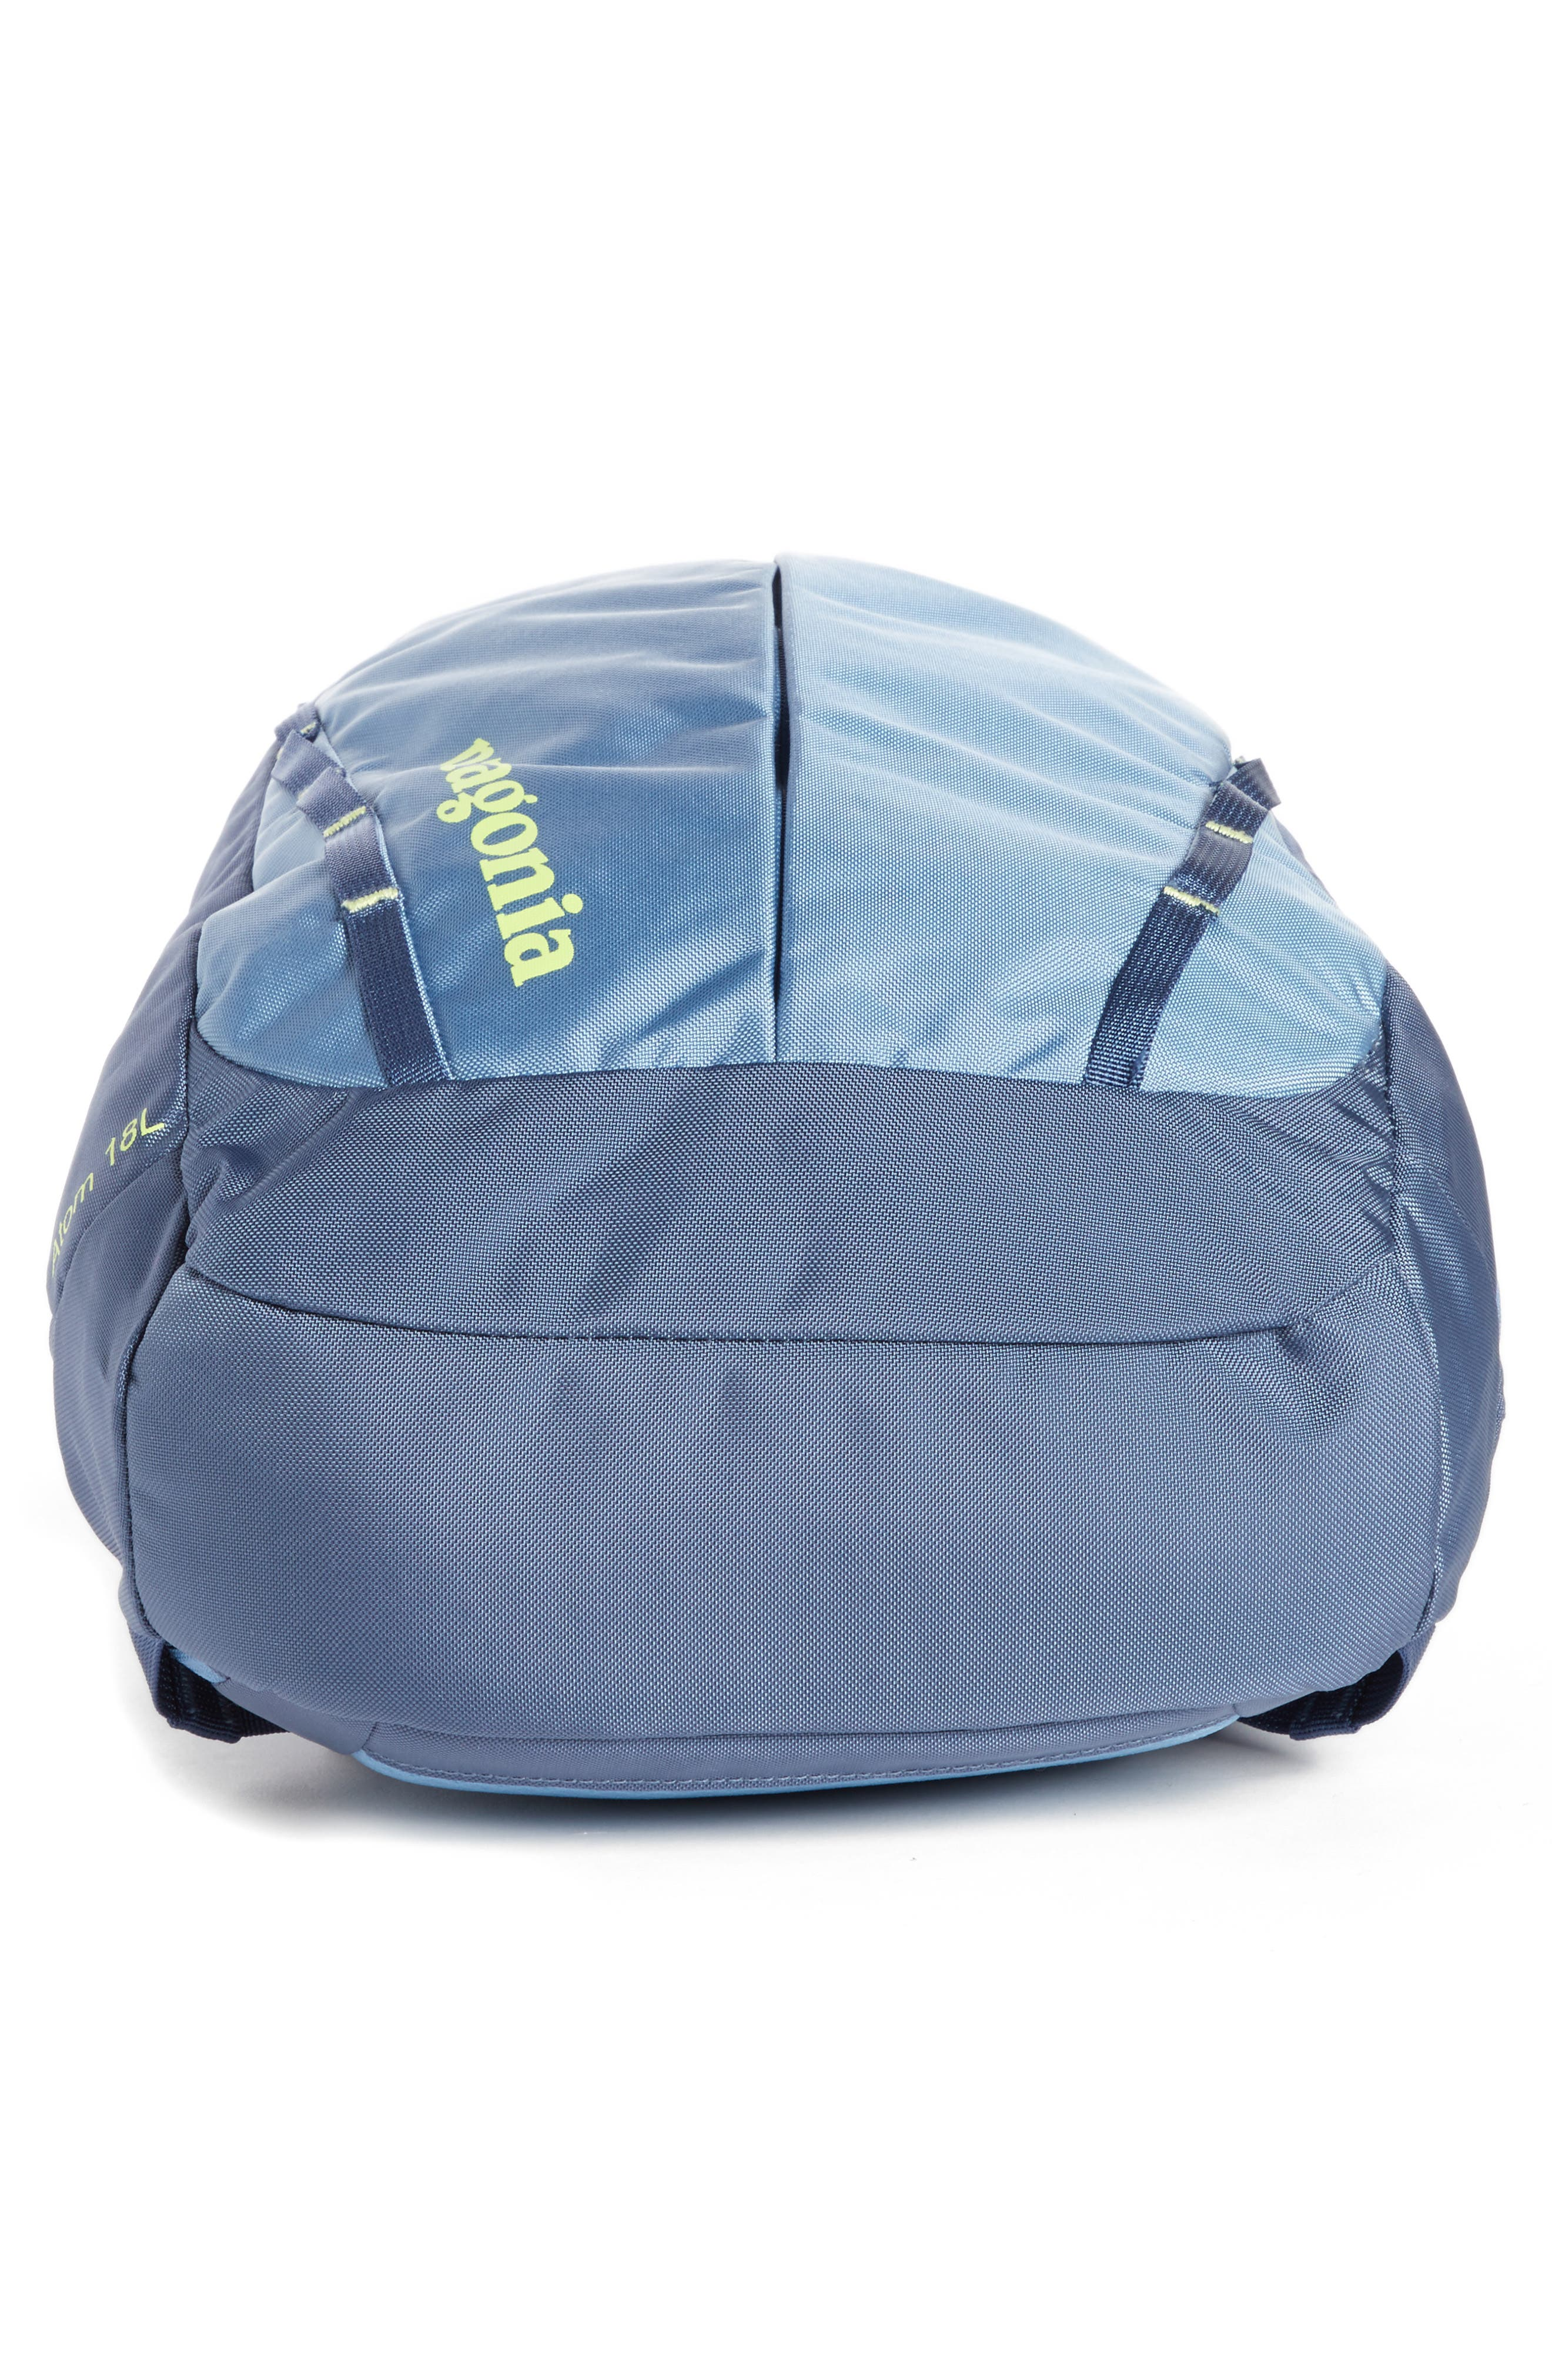 18L Atom Backpack,                             Alternate thumbnail 6, color,                             Dolomite Blue